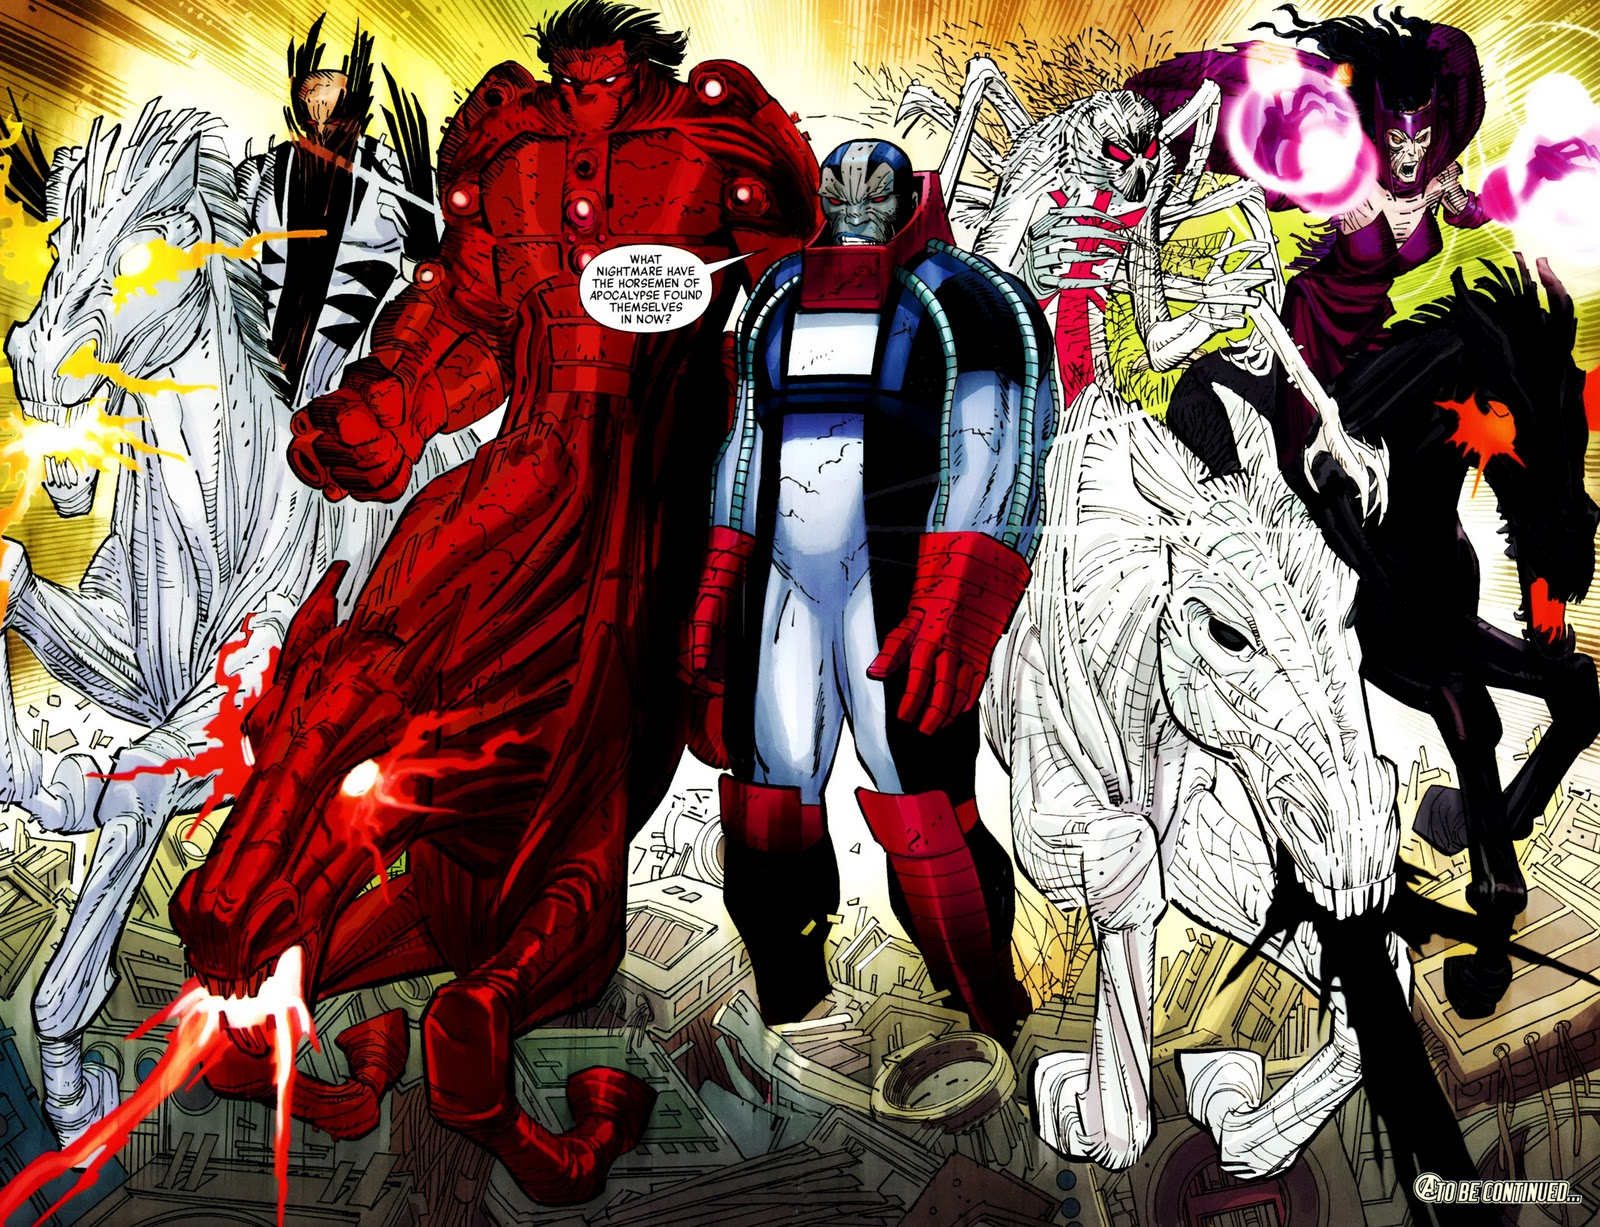 http://3.bp.blogspot.com/-E-Yet-zAUuY/TZ6nJcwR5YI/AAAAAAAAHeo/6kLICab1lUc/s1600/avengers_2_legion_cps_030-031.jpg